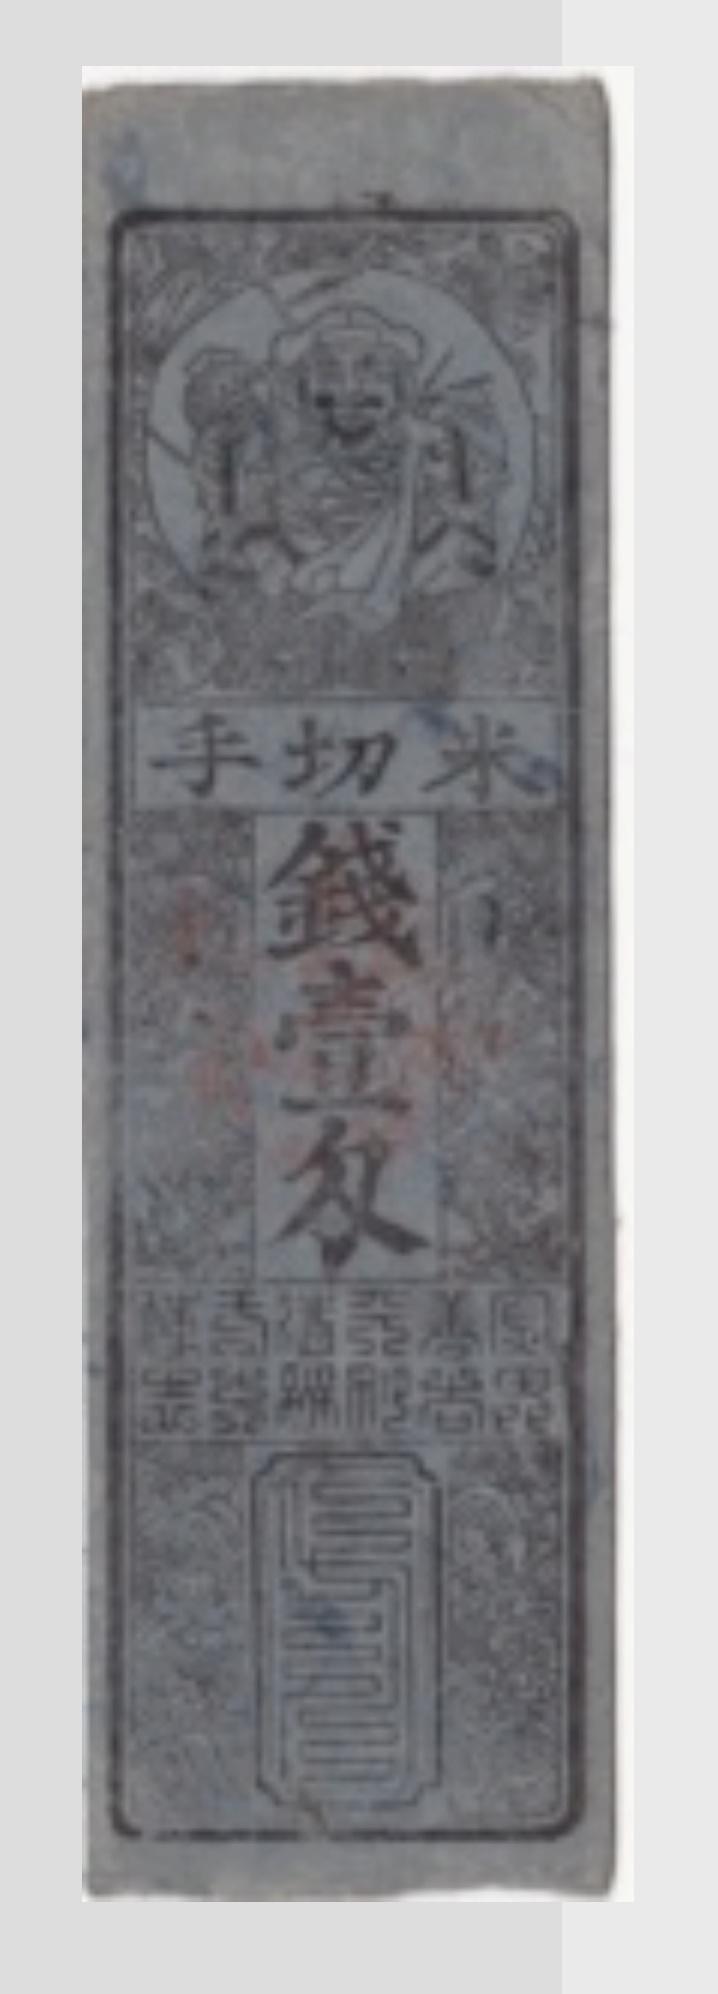 1 Hansatsu - 1 Monme de Plata Japón - 1863 Captur12